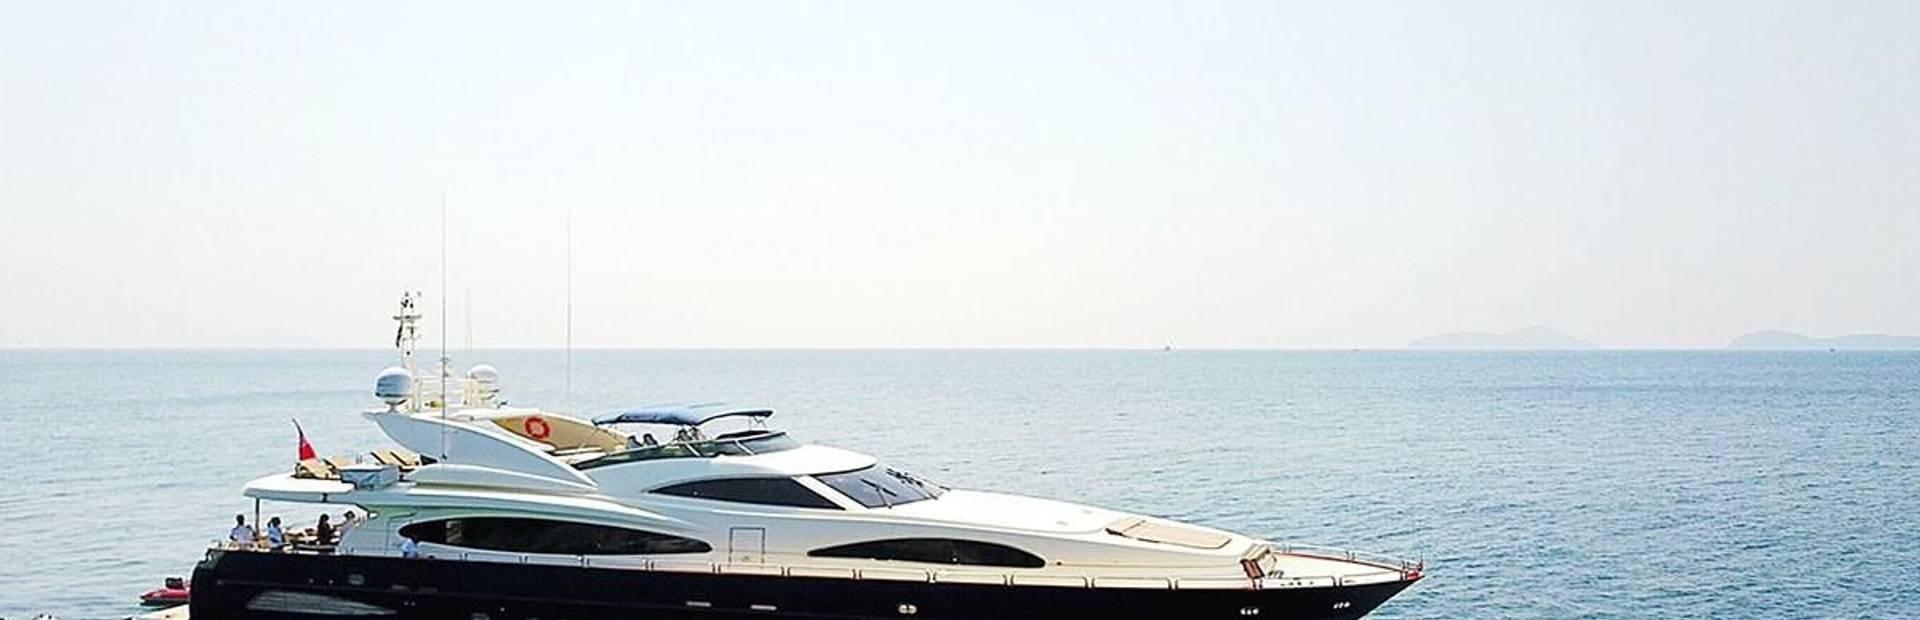 102 GLX Yacht Charter